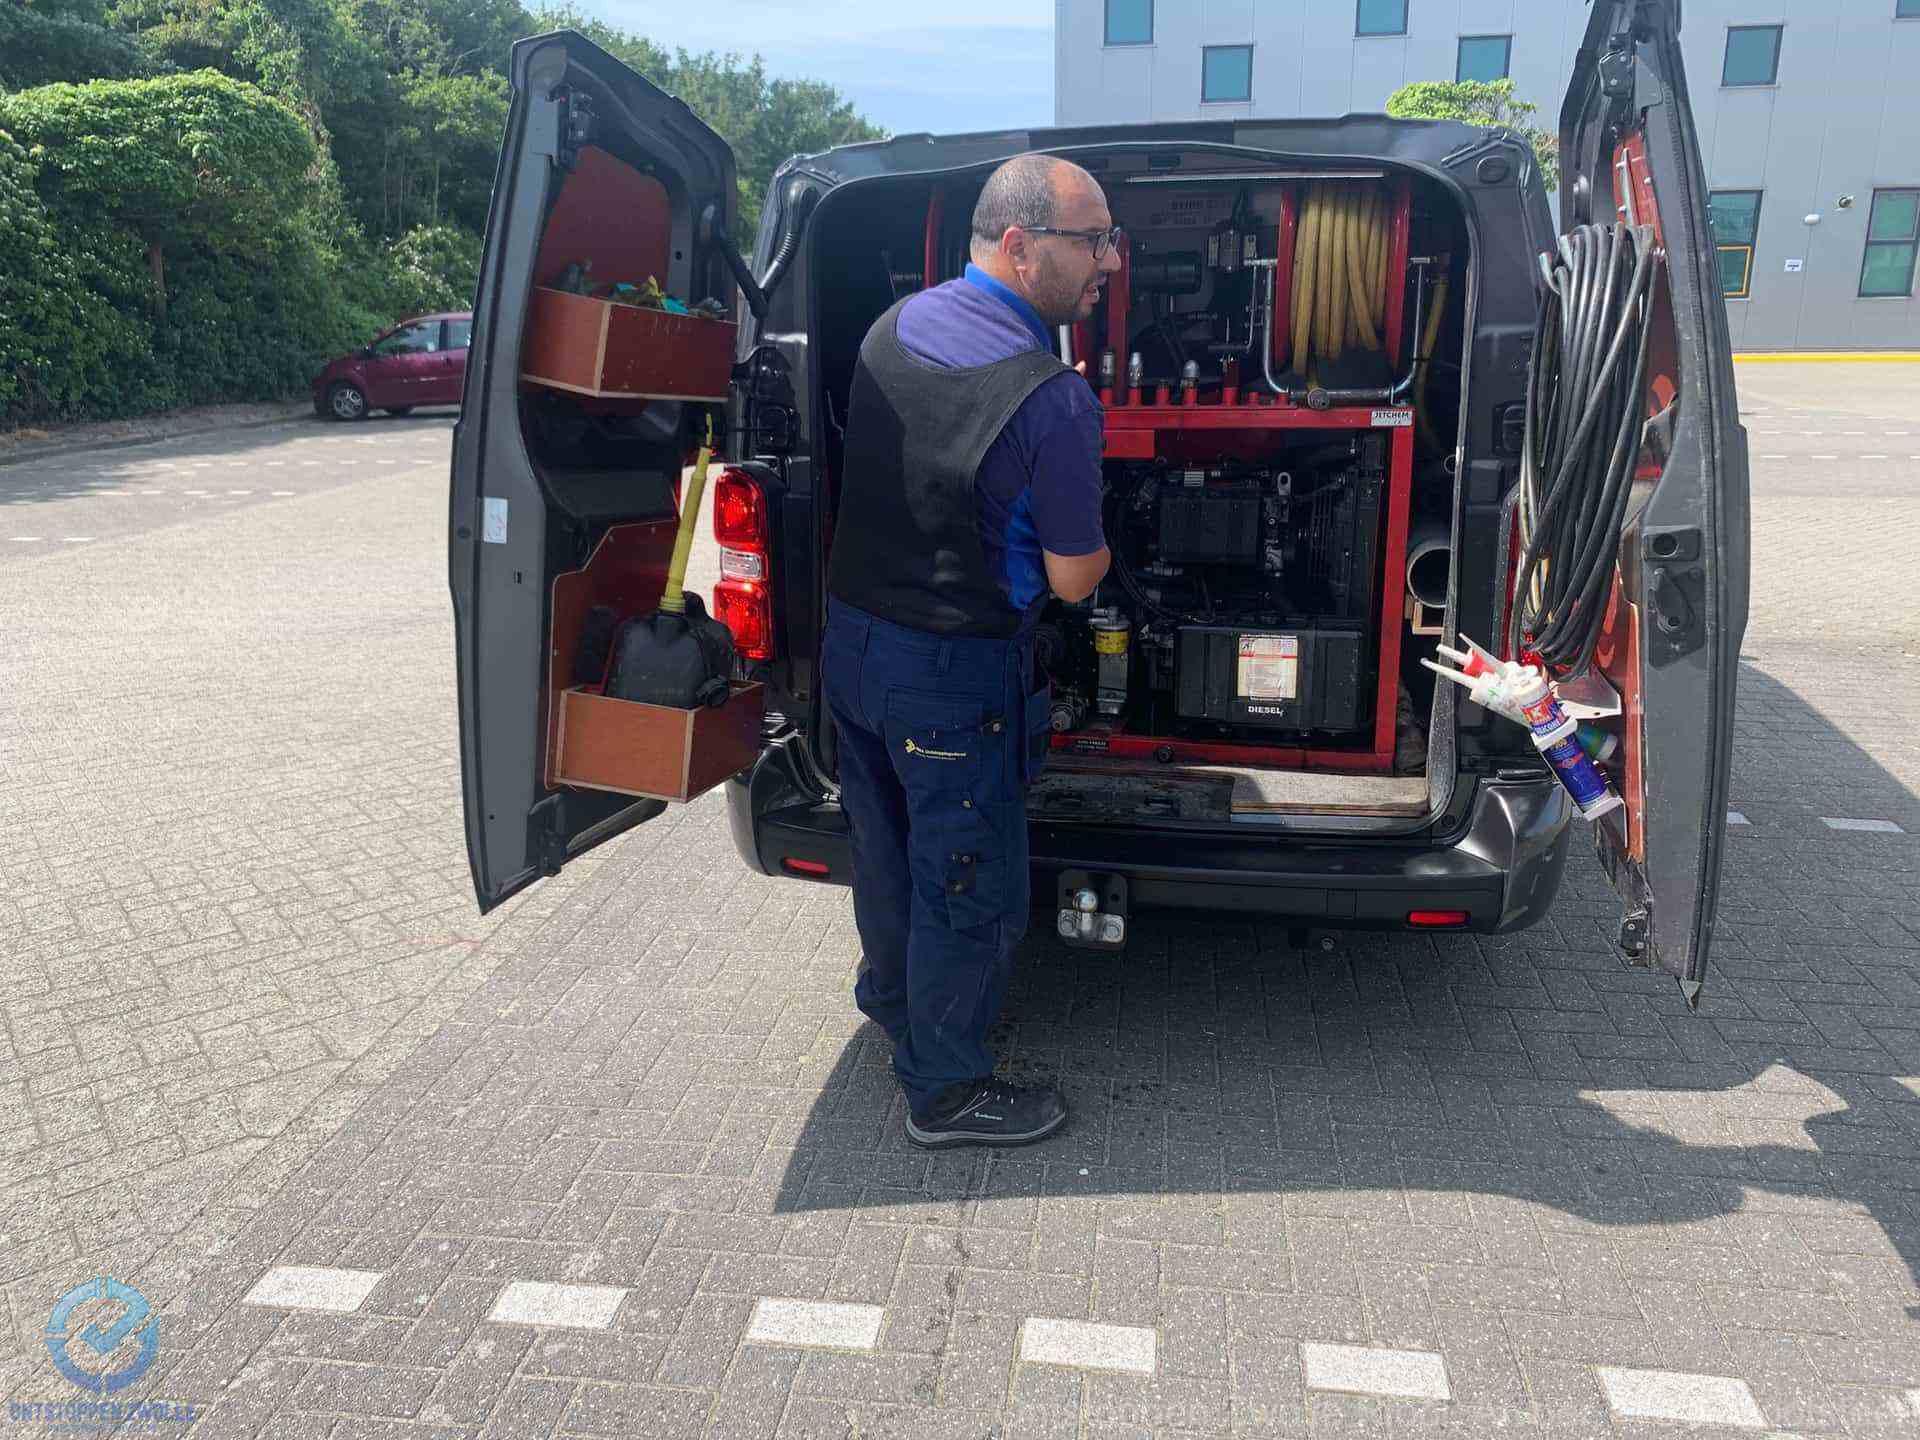 Loodgieter Zwolle Ontstopping